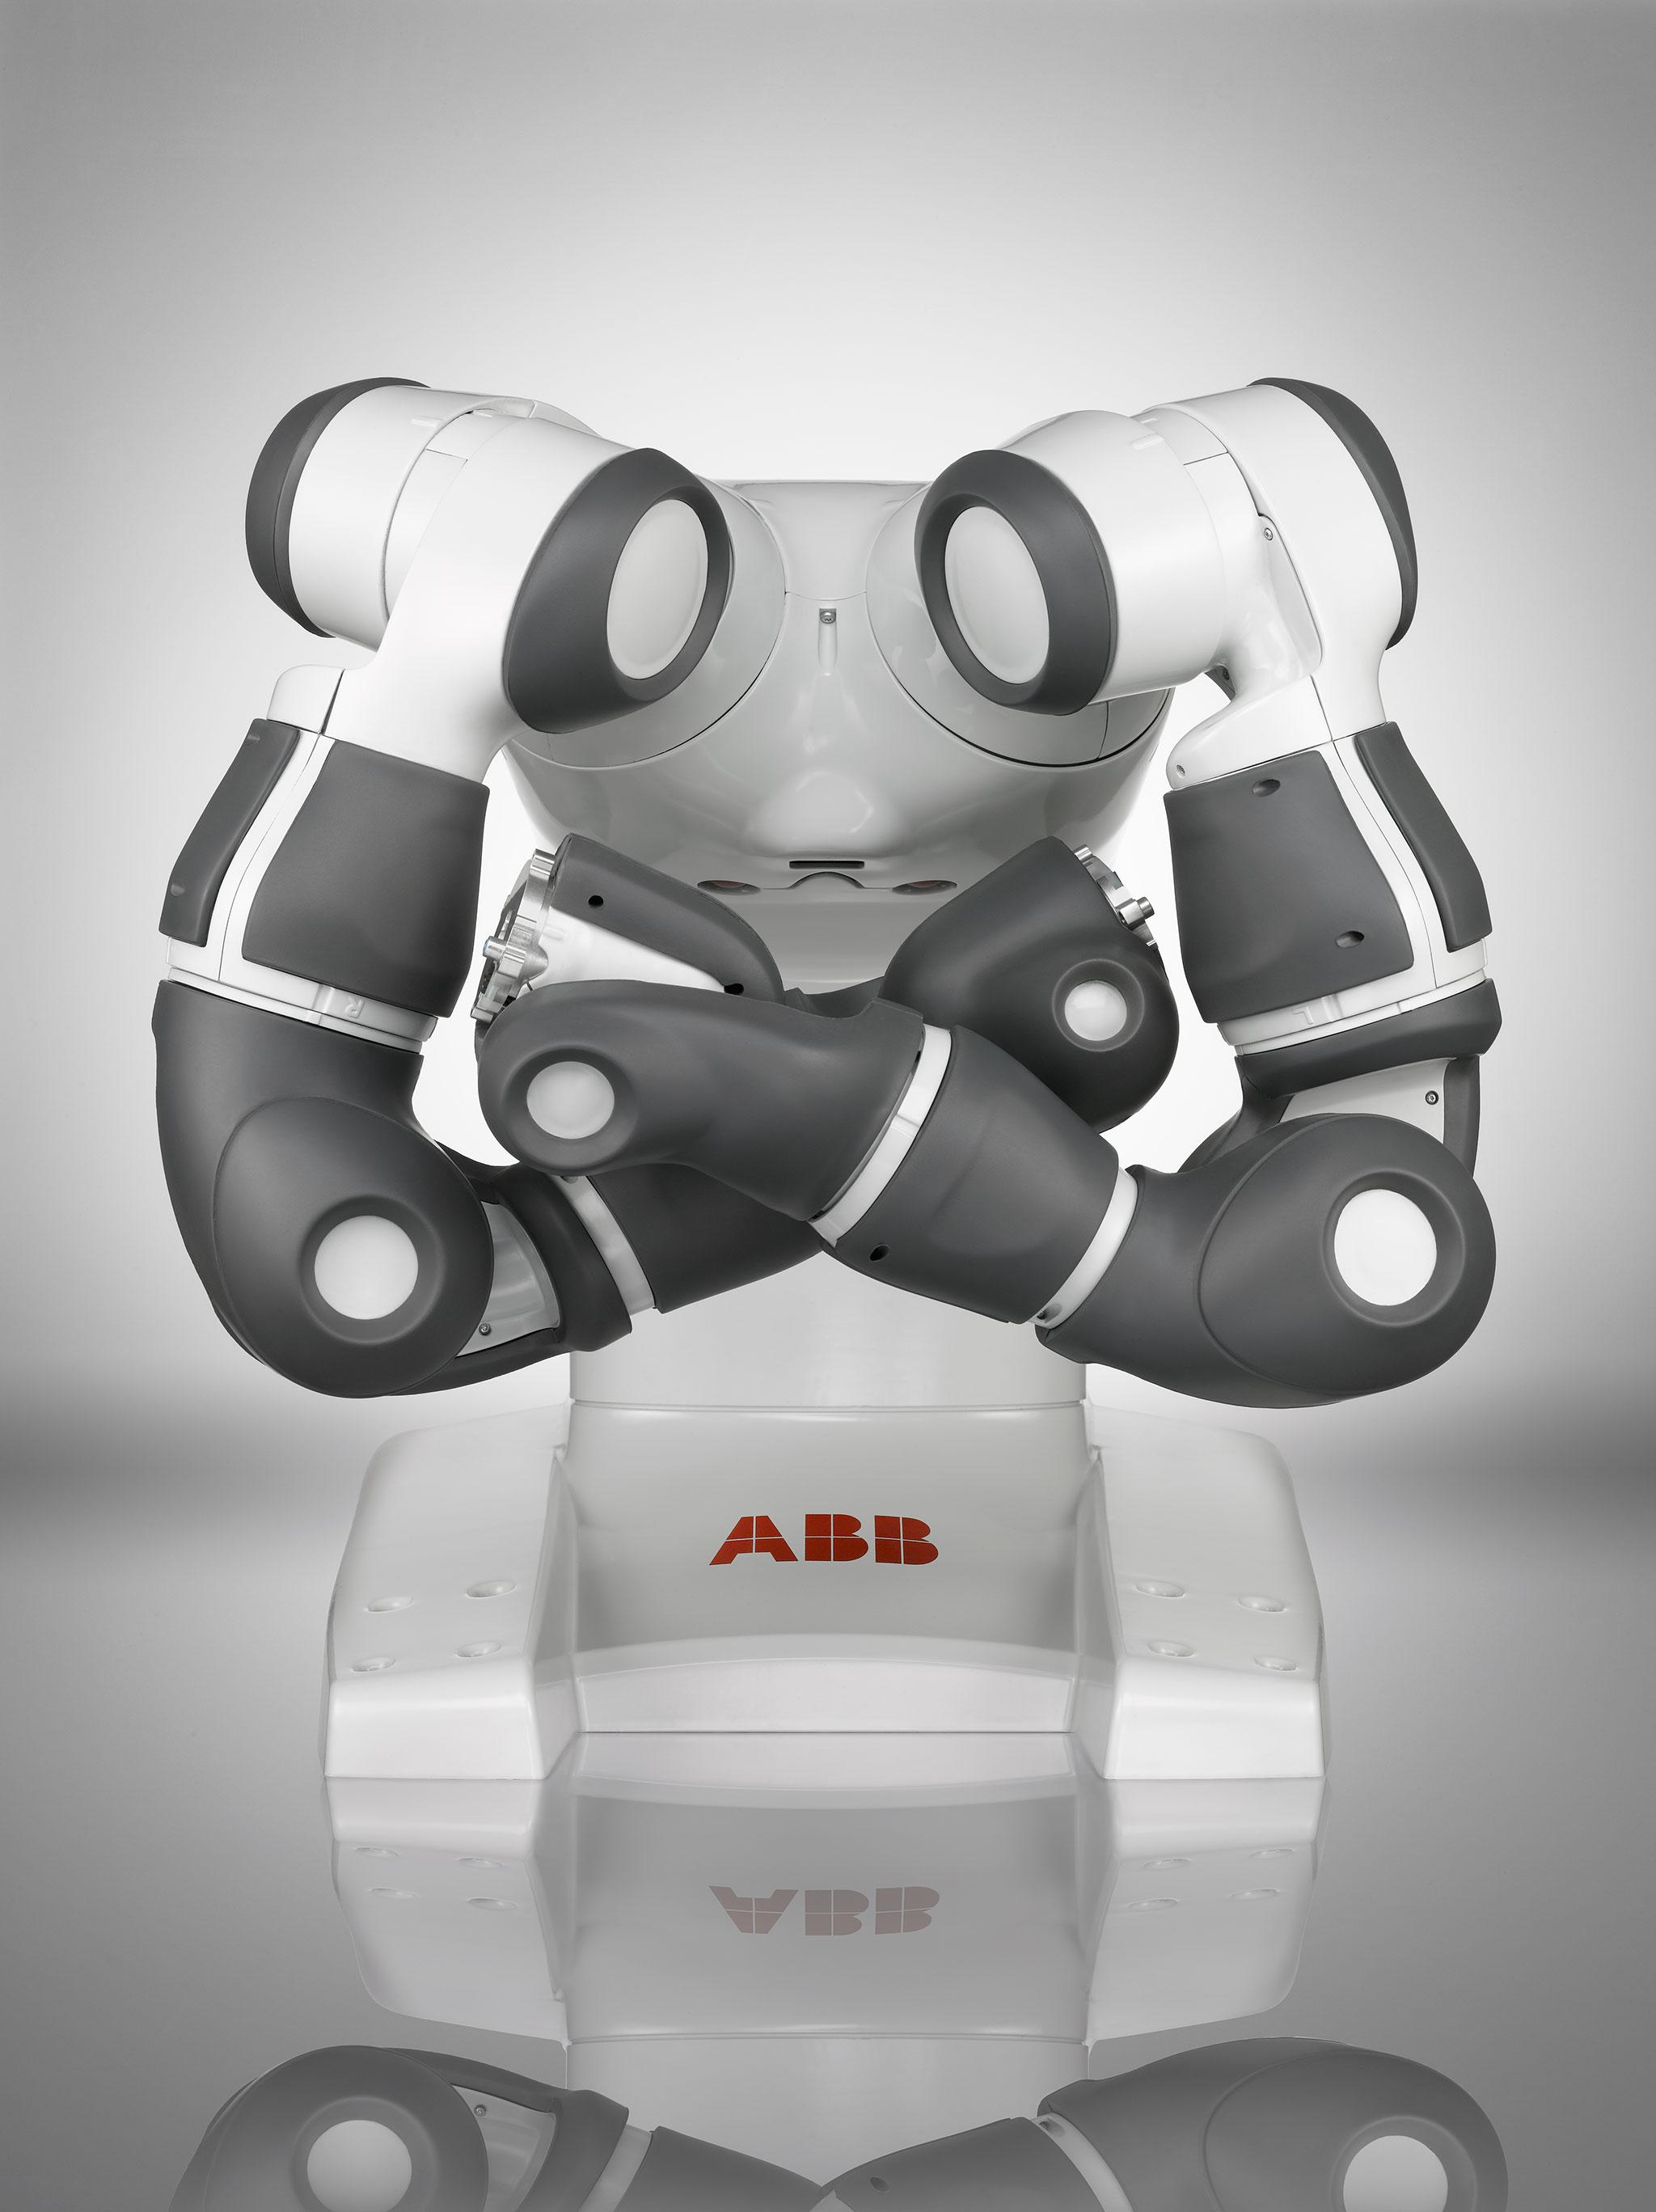 3d Animated Desktop Wallpaper Download Yumi Irb 14000 220 Berblick Abb Industrieroboter